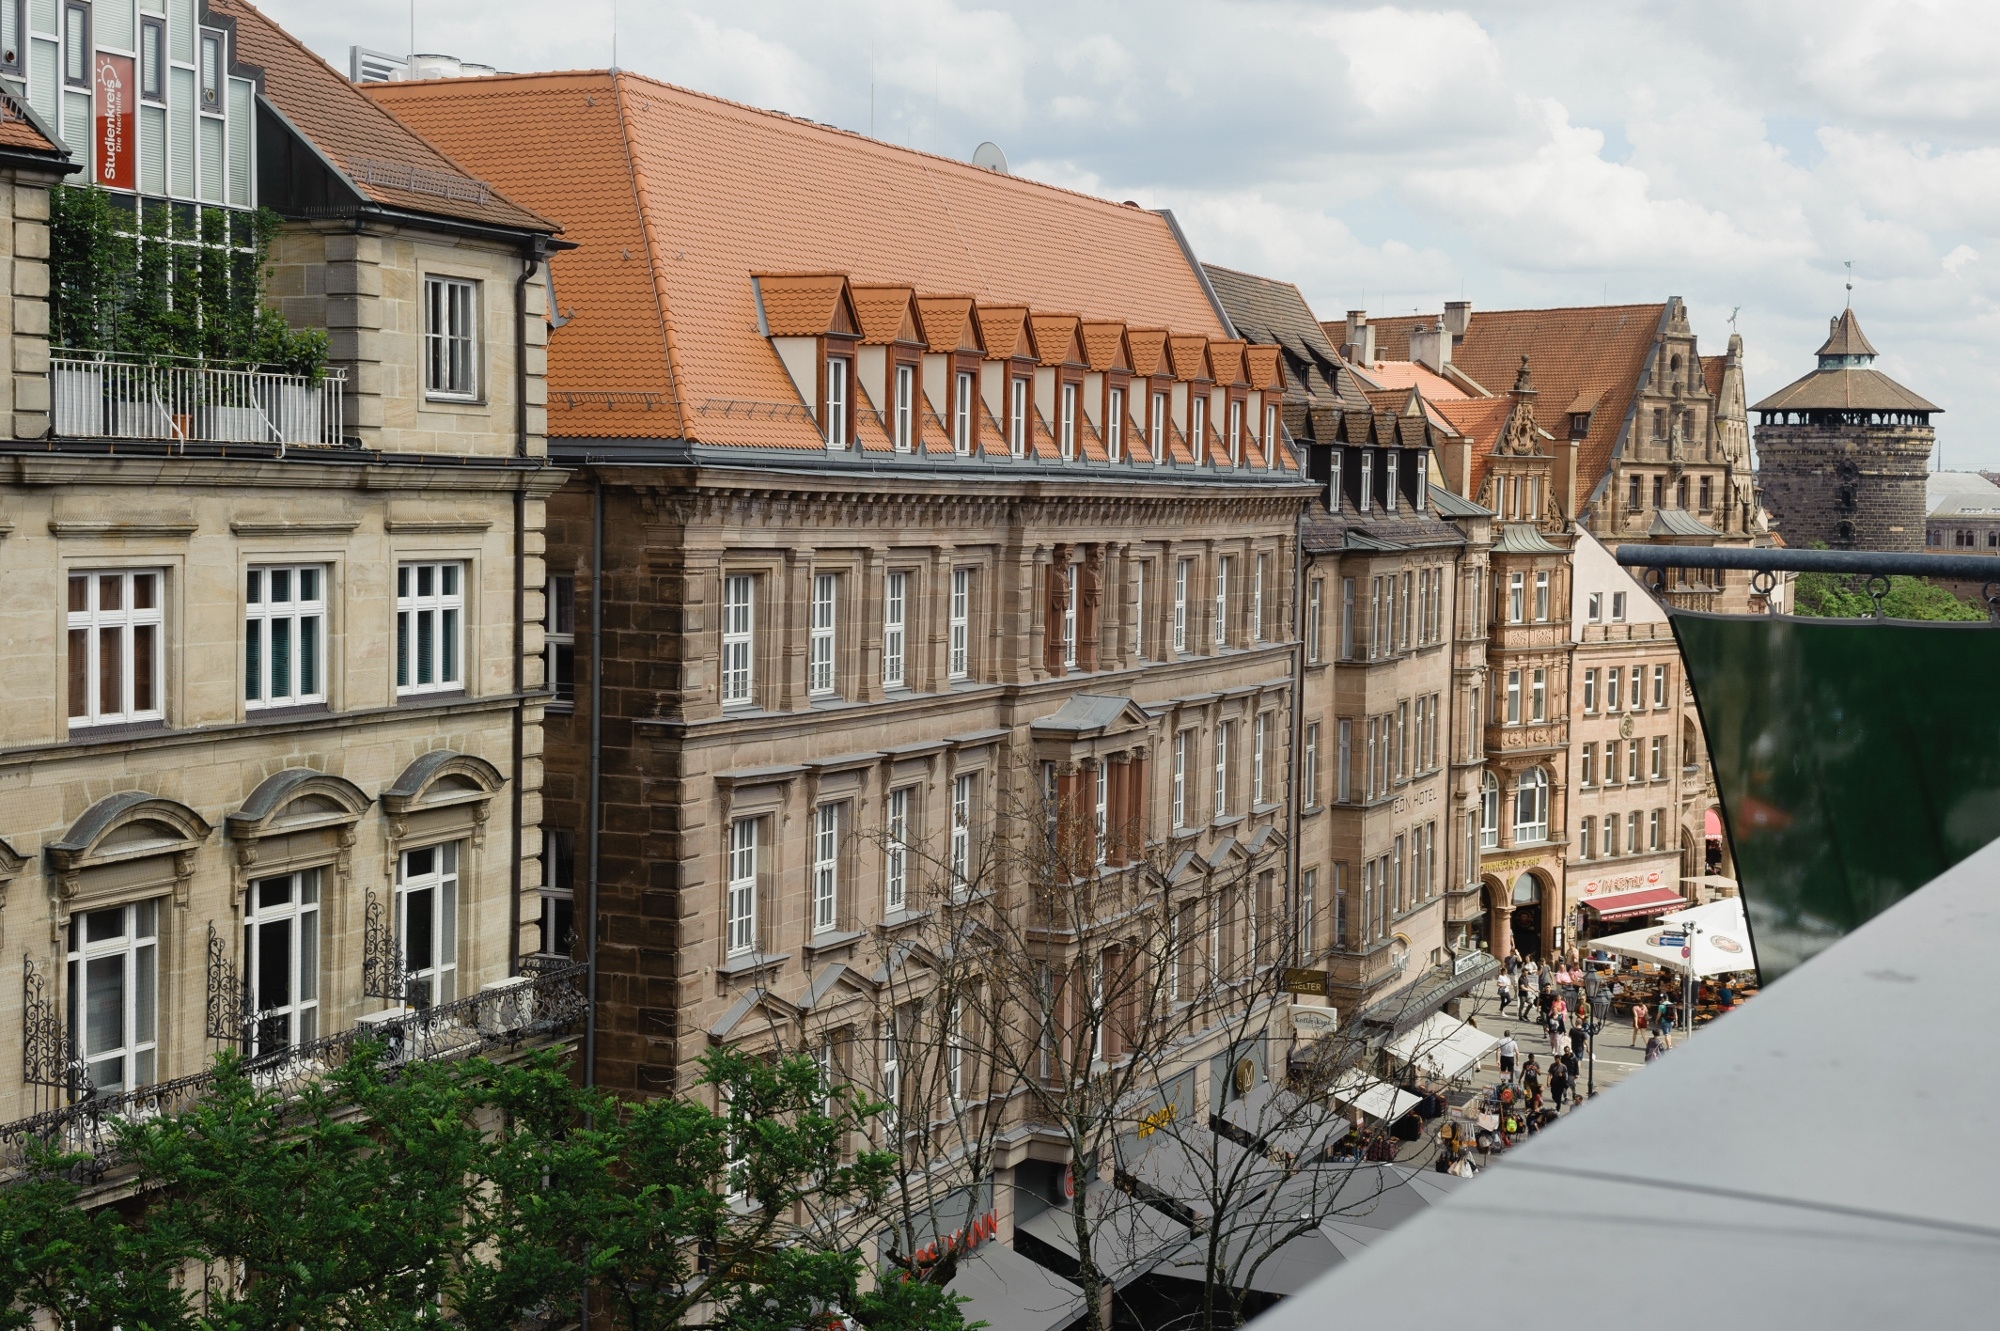 "<span style=""font-size:17px""><span style=""color:#0073bd"">Hotel Königsstraße – Nürnberg</span></span>"